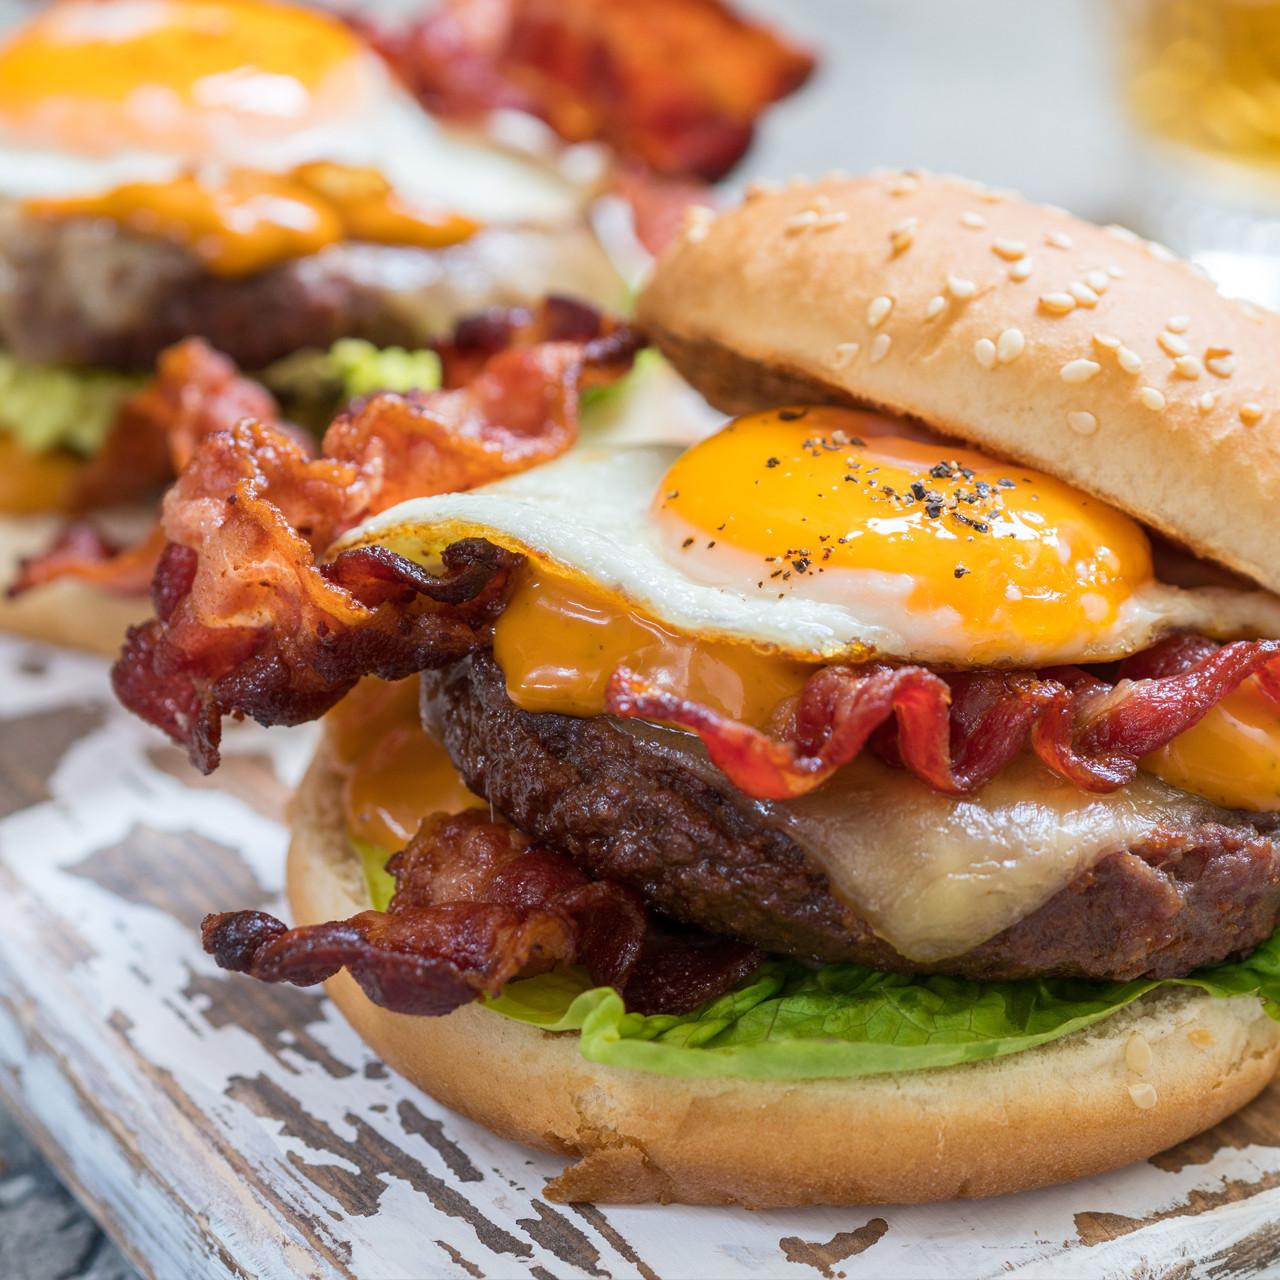 Zesty Western Burger Seasoning